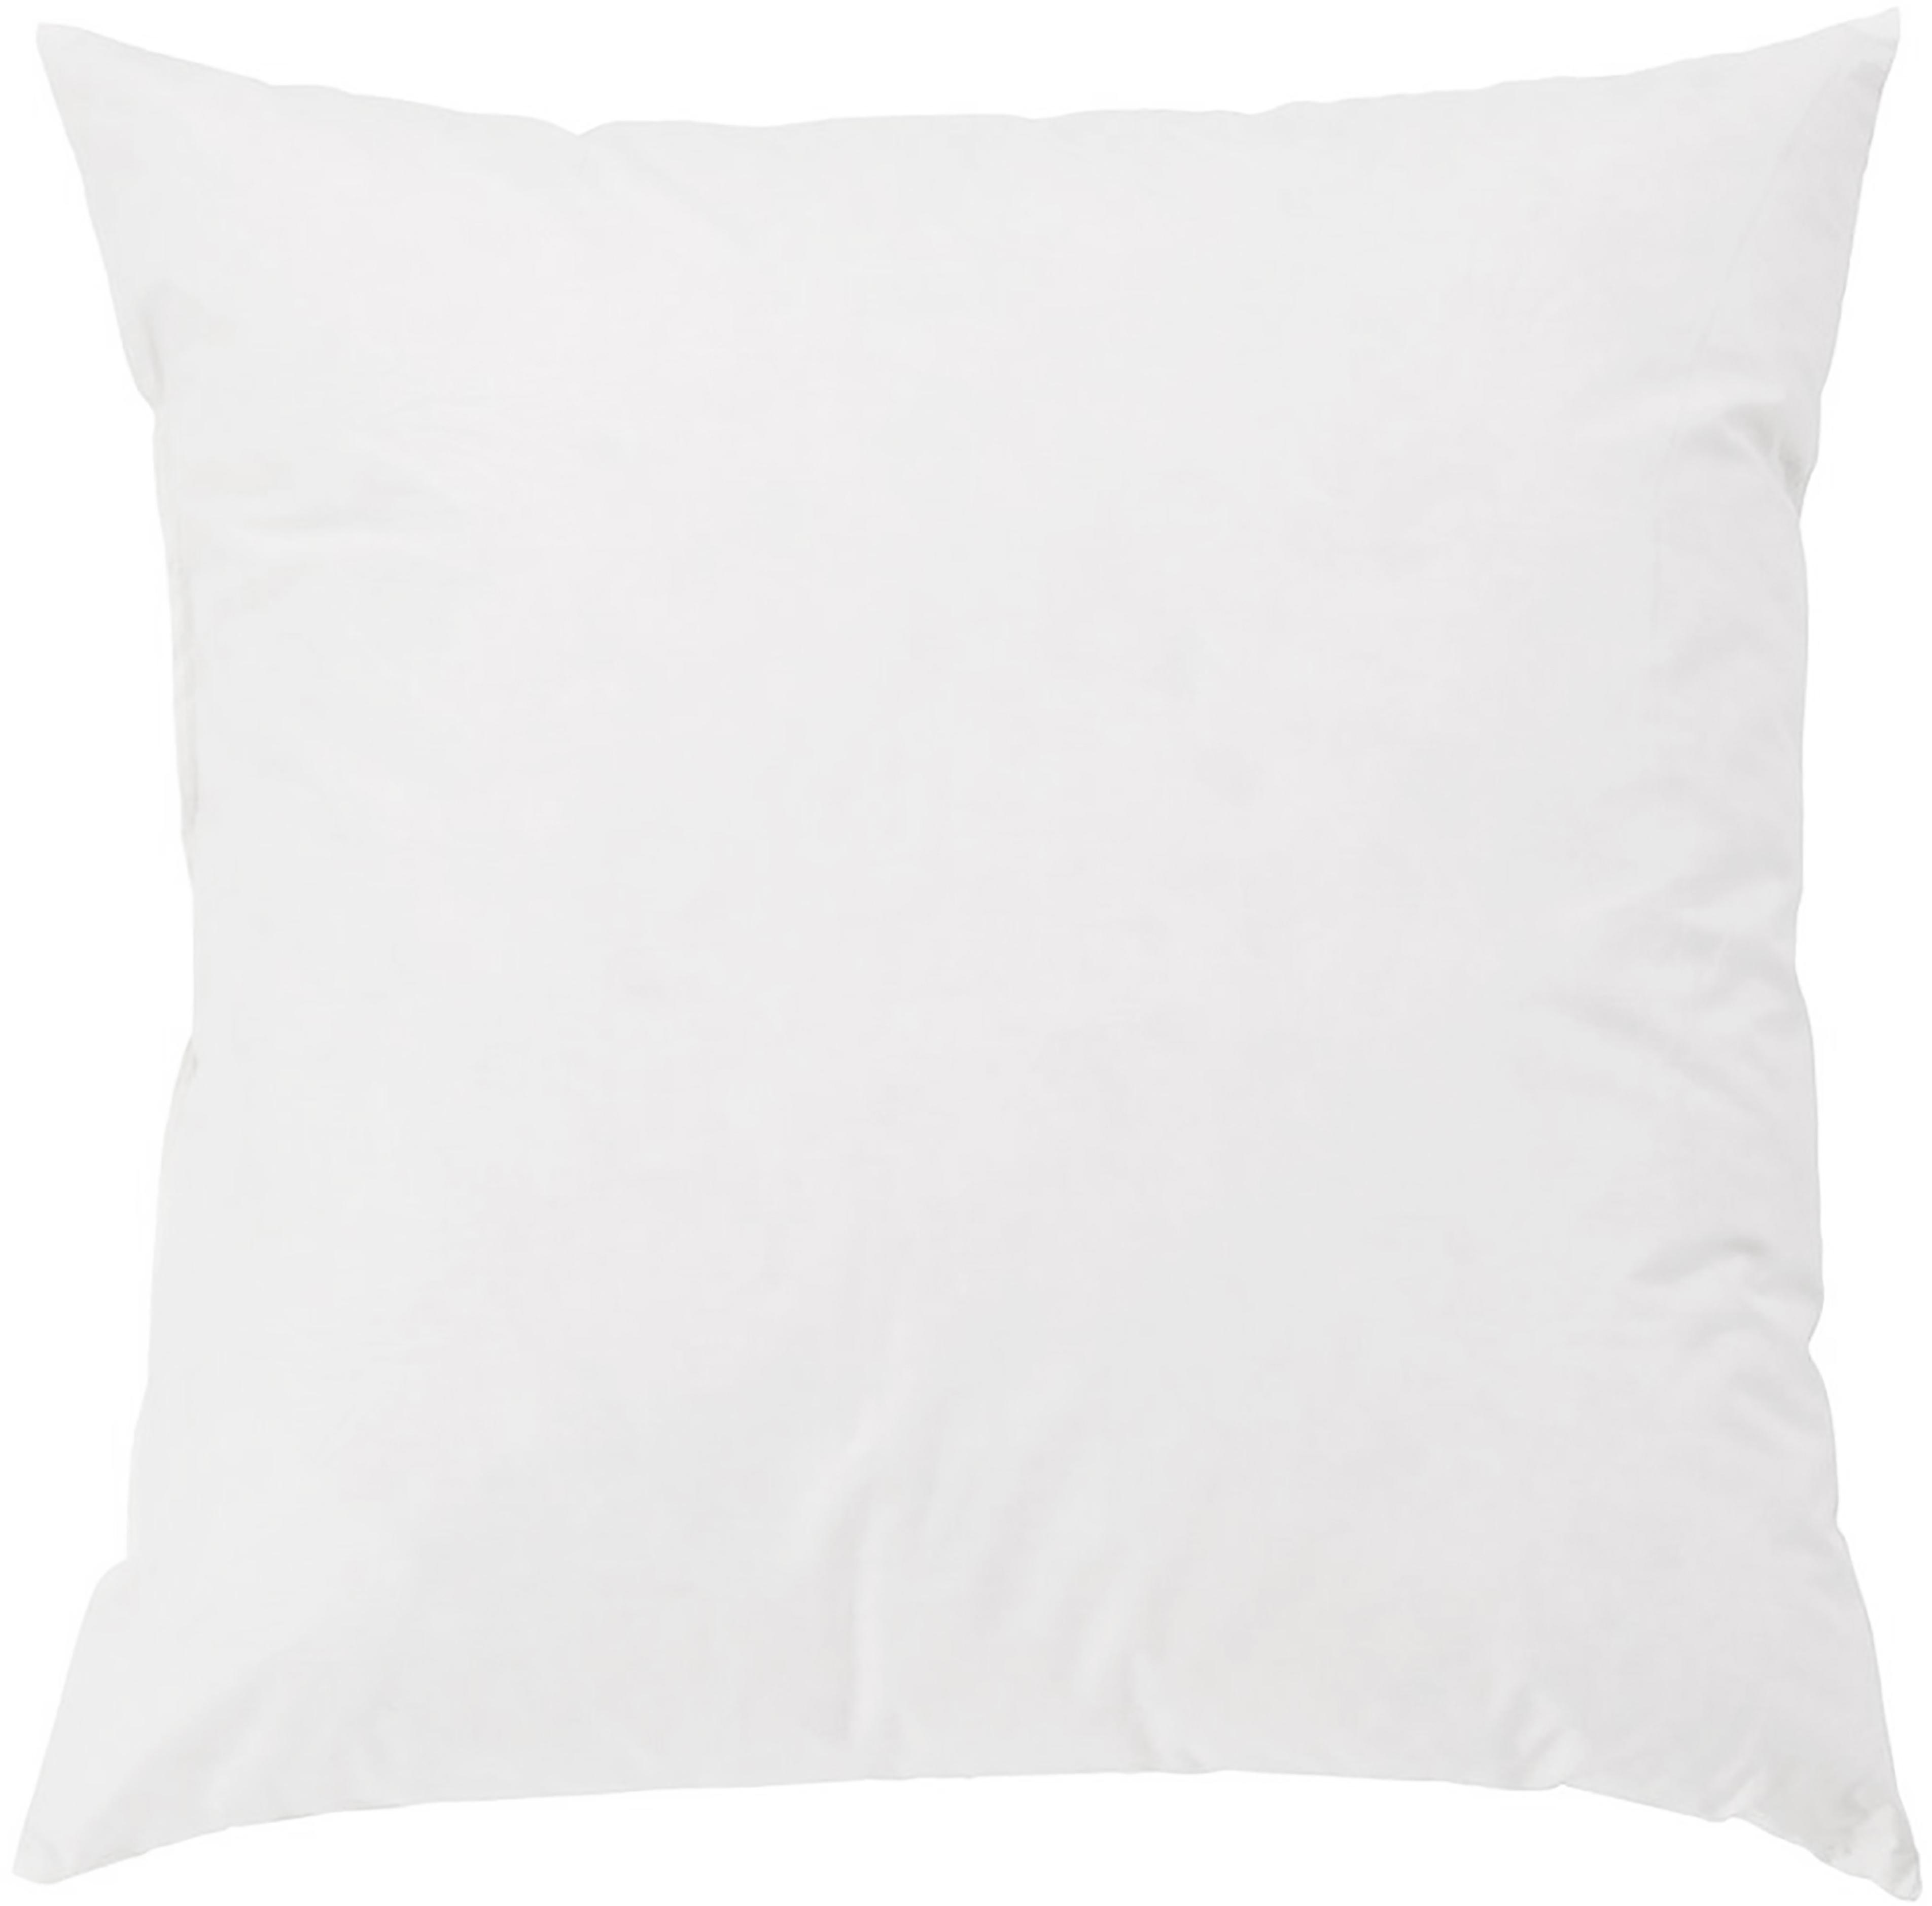 Imbottitura per cuscino Comfort, 40 x 40, imbottitura in piuma, Bianco, Larg. 40 x Lung. 40 cm